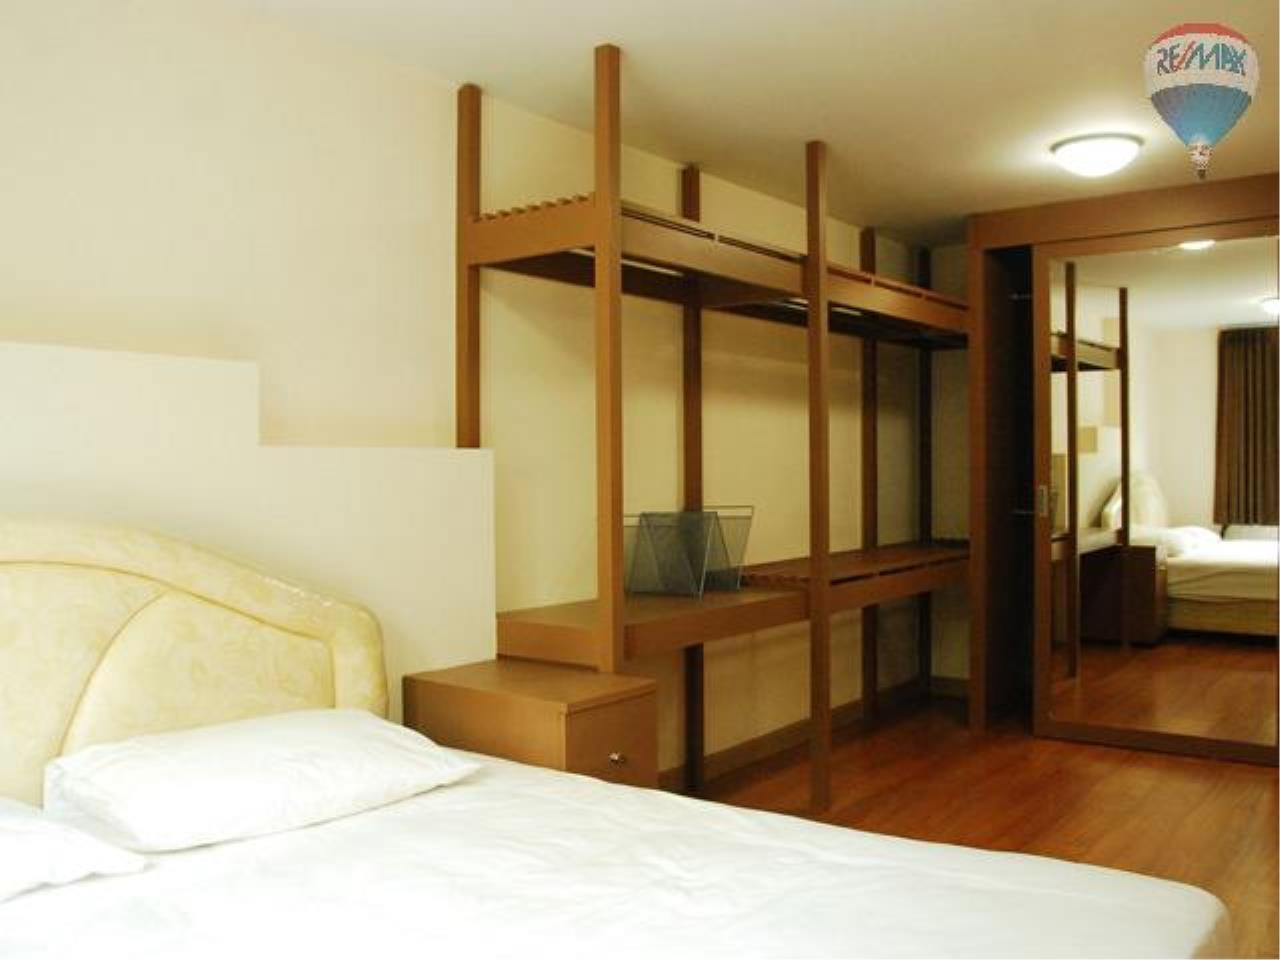 RE/MAX Properties Agency's Condominium for rent 1 bedroom 49.5 Sq.m. at Condo One  2